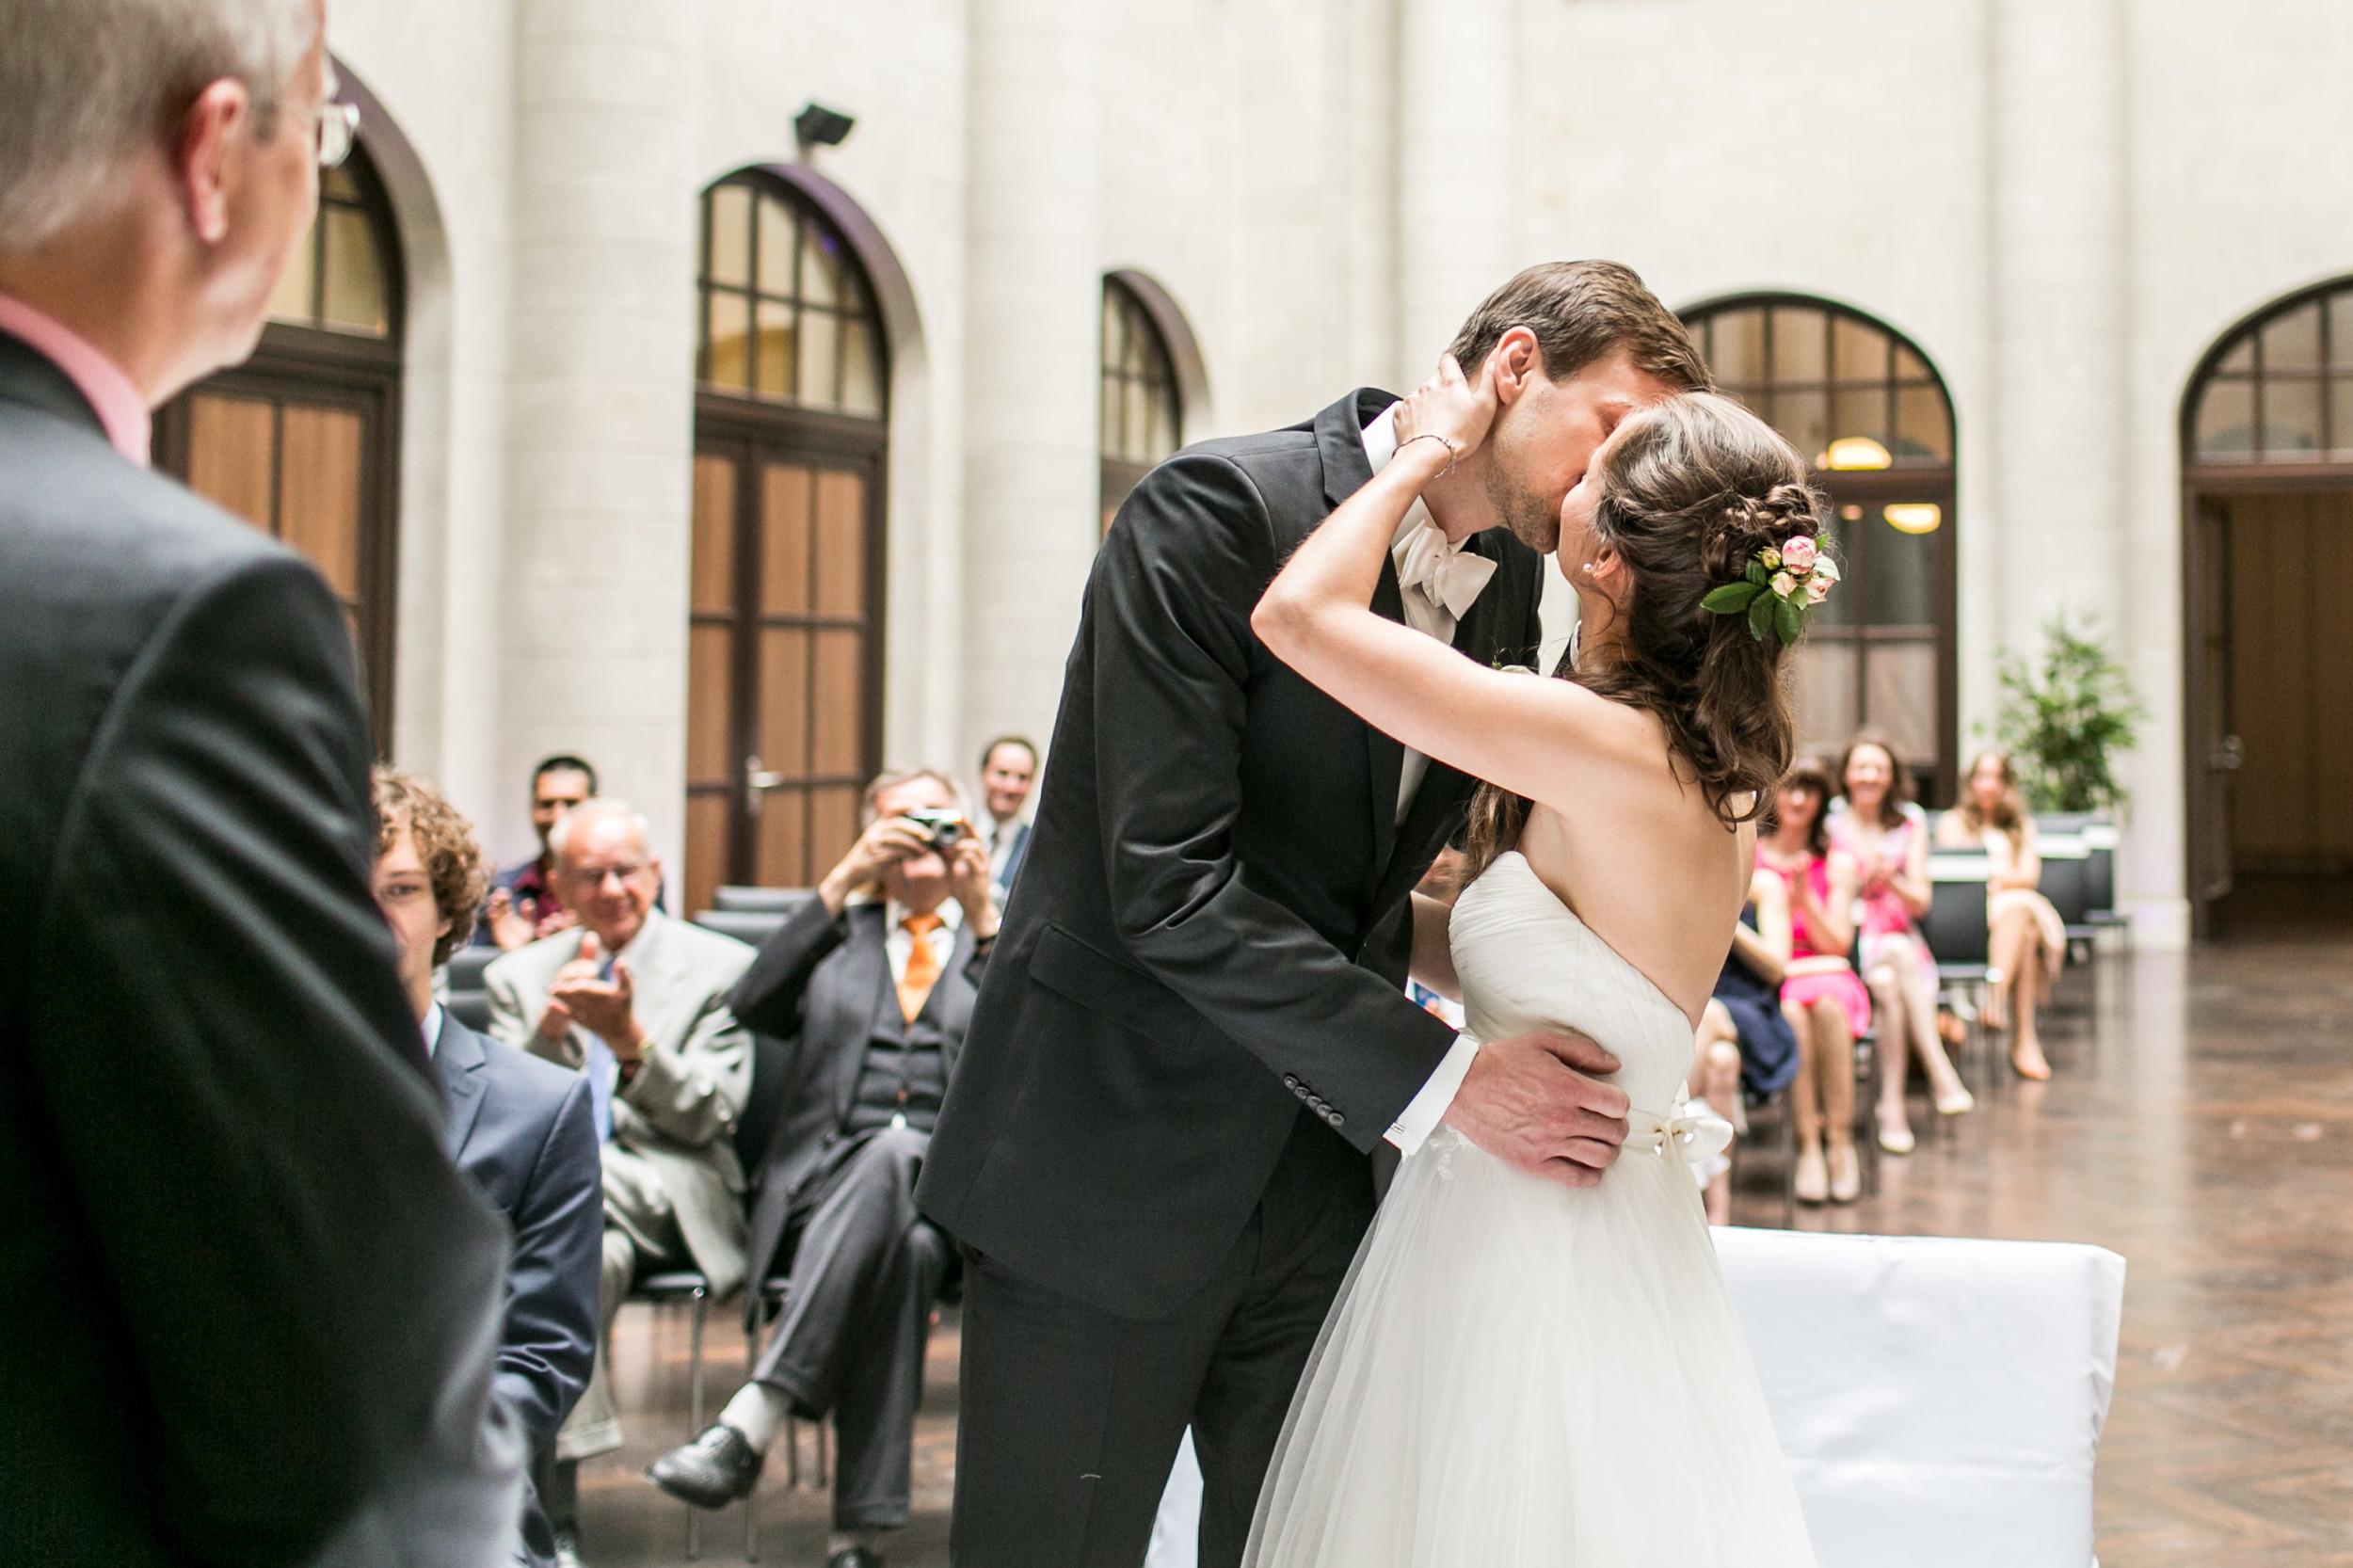 Berlin Hochzeitsfotografie_Fran Burrows Fotografie-9.jpg